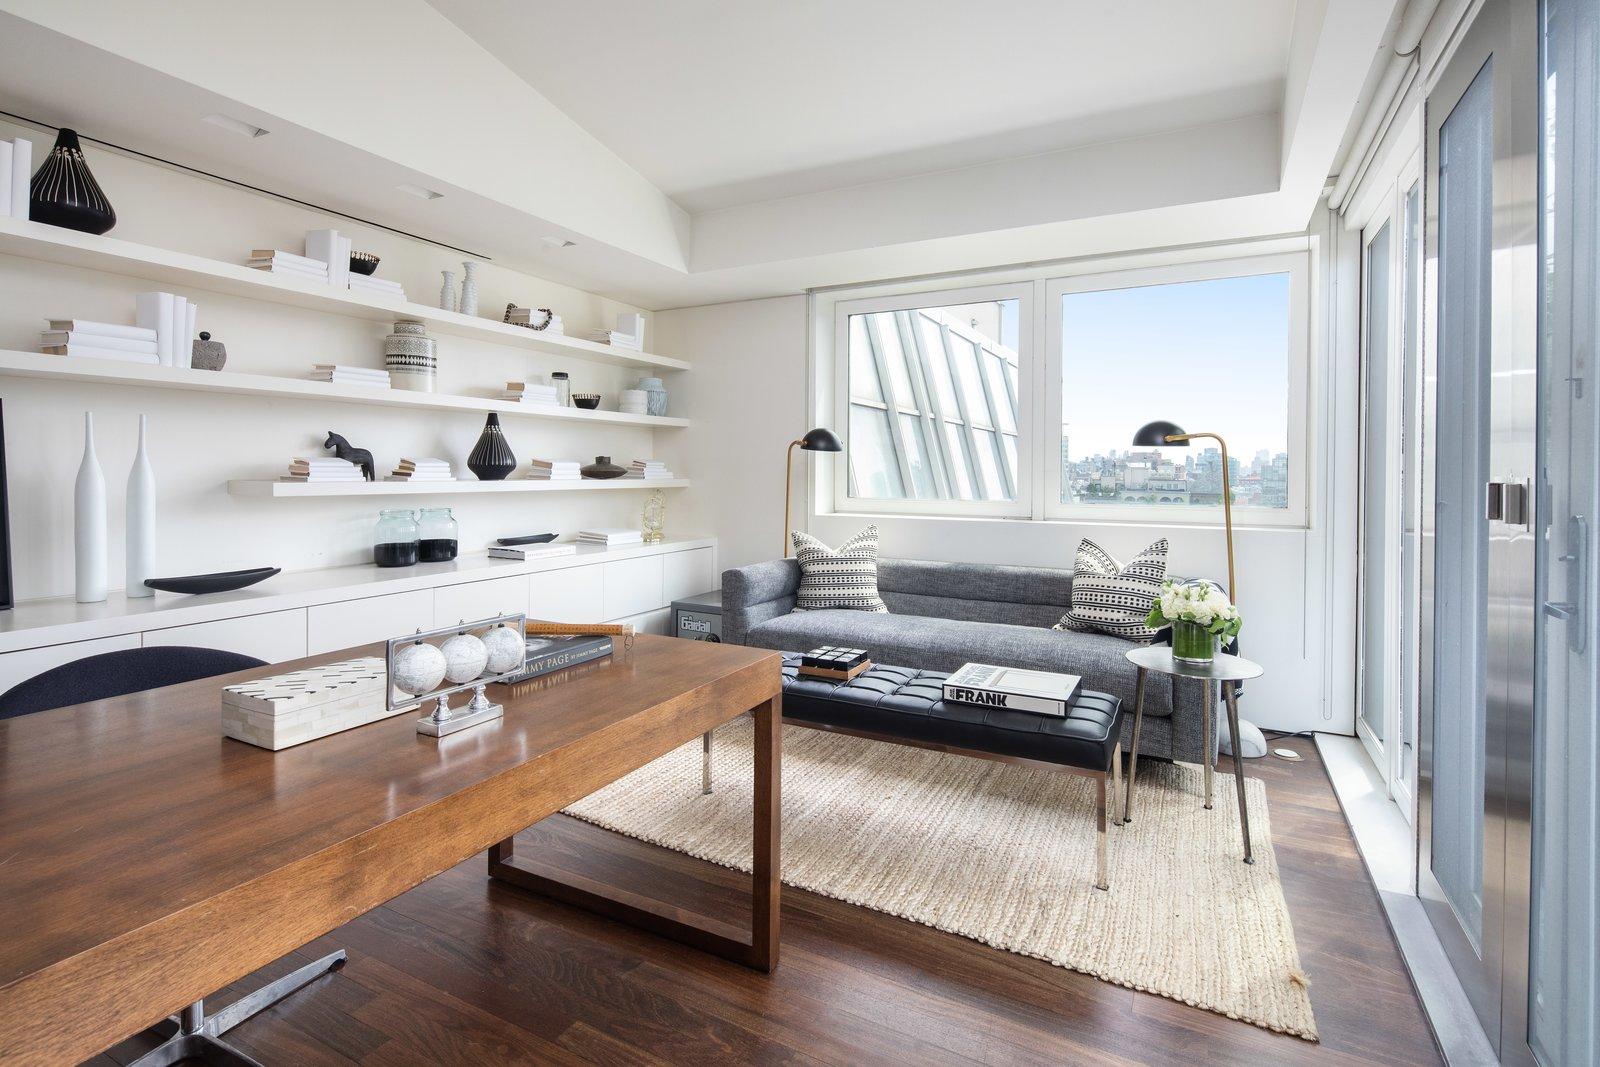 River Lofts Tsao and McKown Streep penthouse office